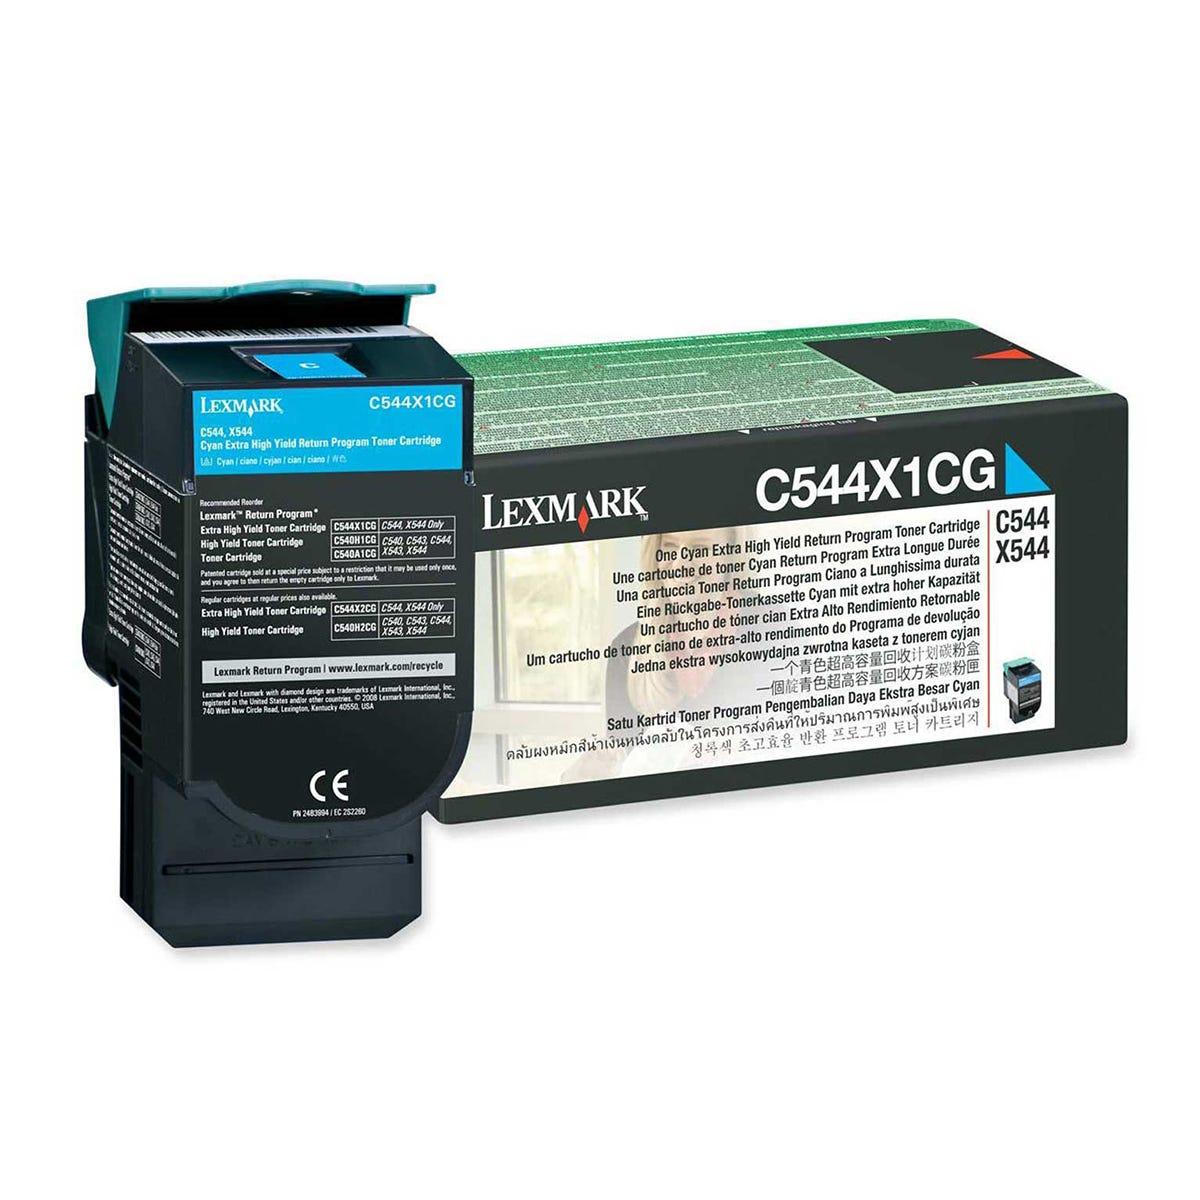 Image of Lexmark C544X1CG Toner Cartridge Extra High Yield, Cyan